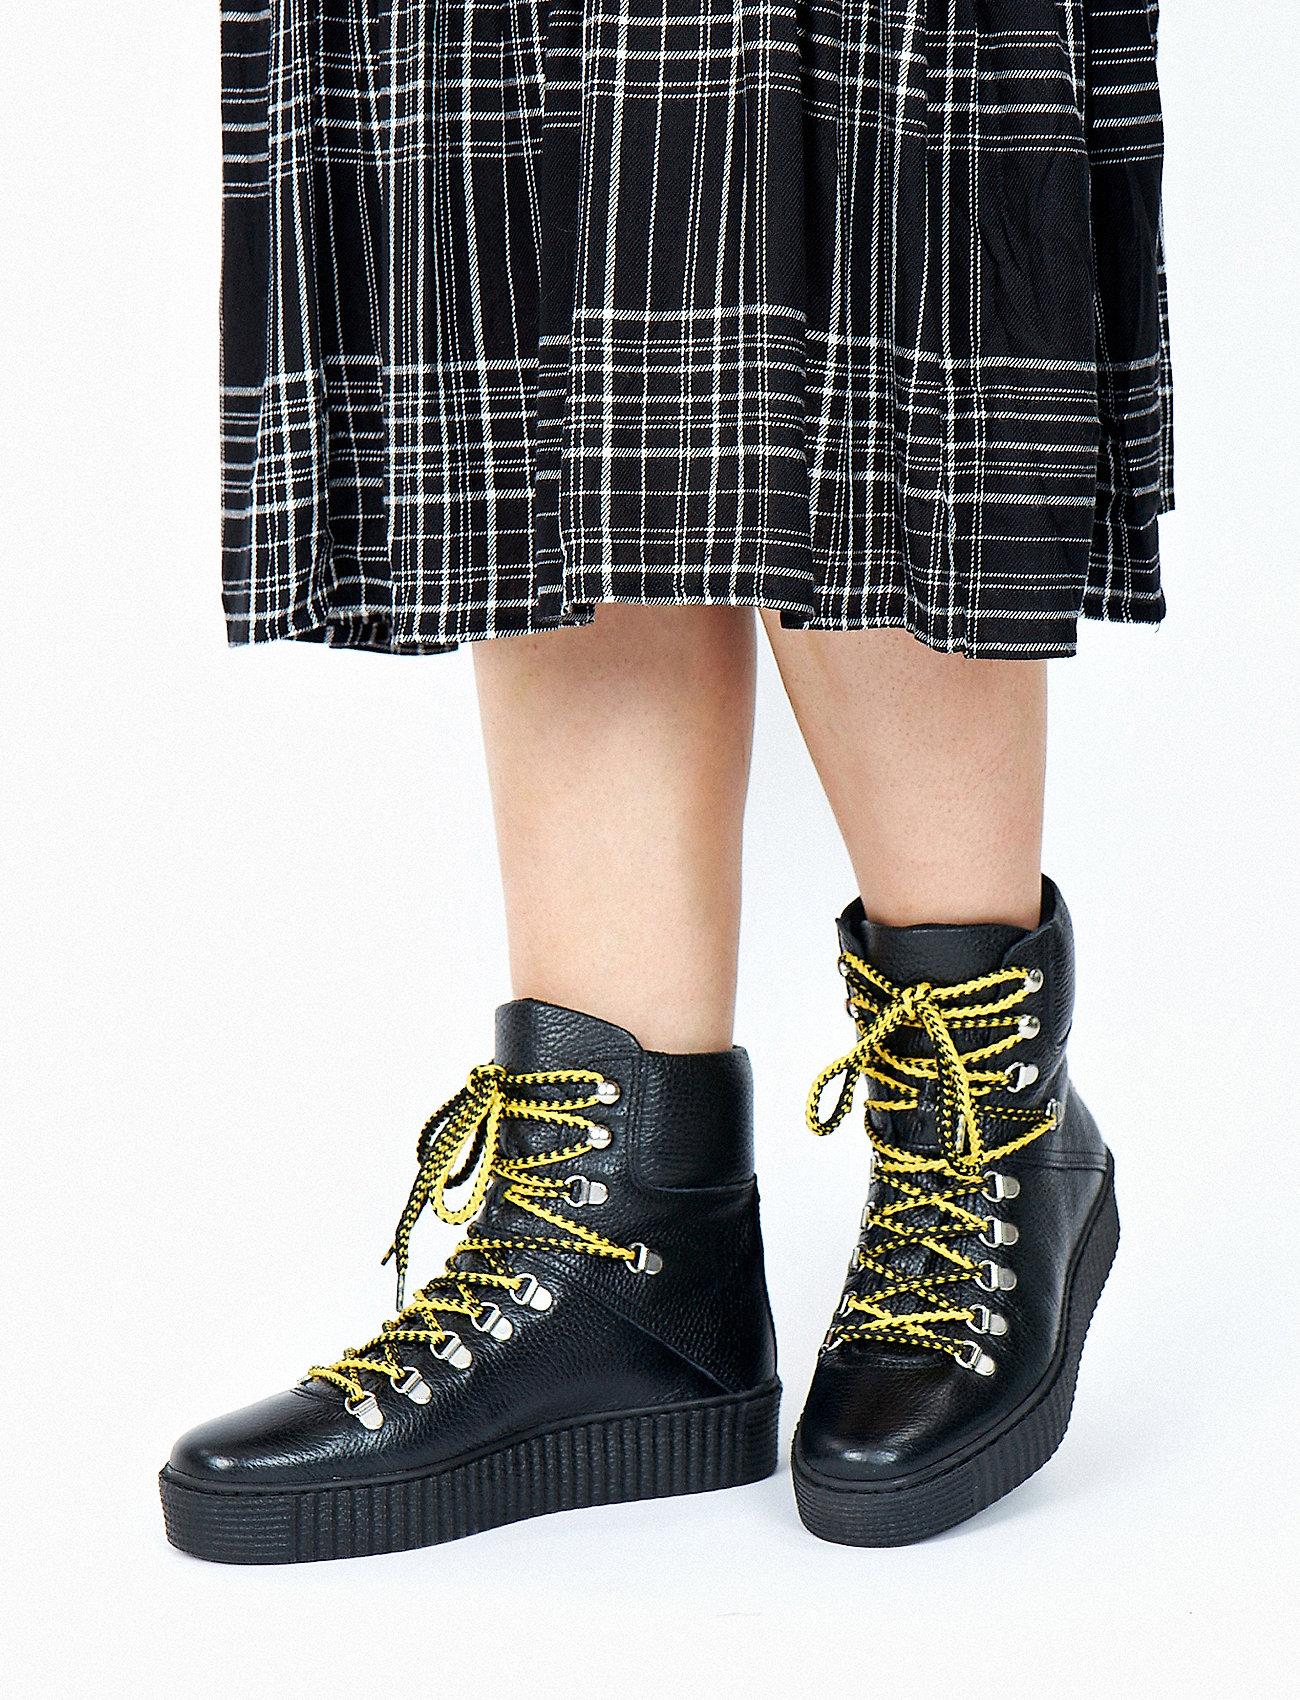 Shoe The Bear - AGDA L - flat ankle boots - black / black - 0